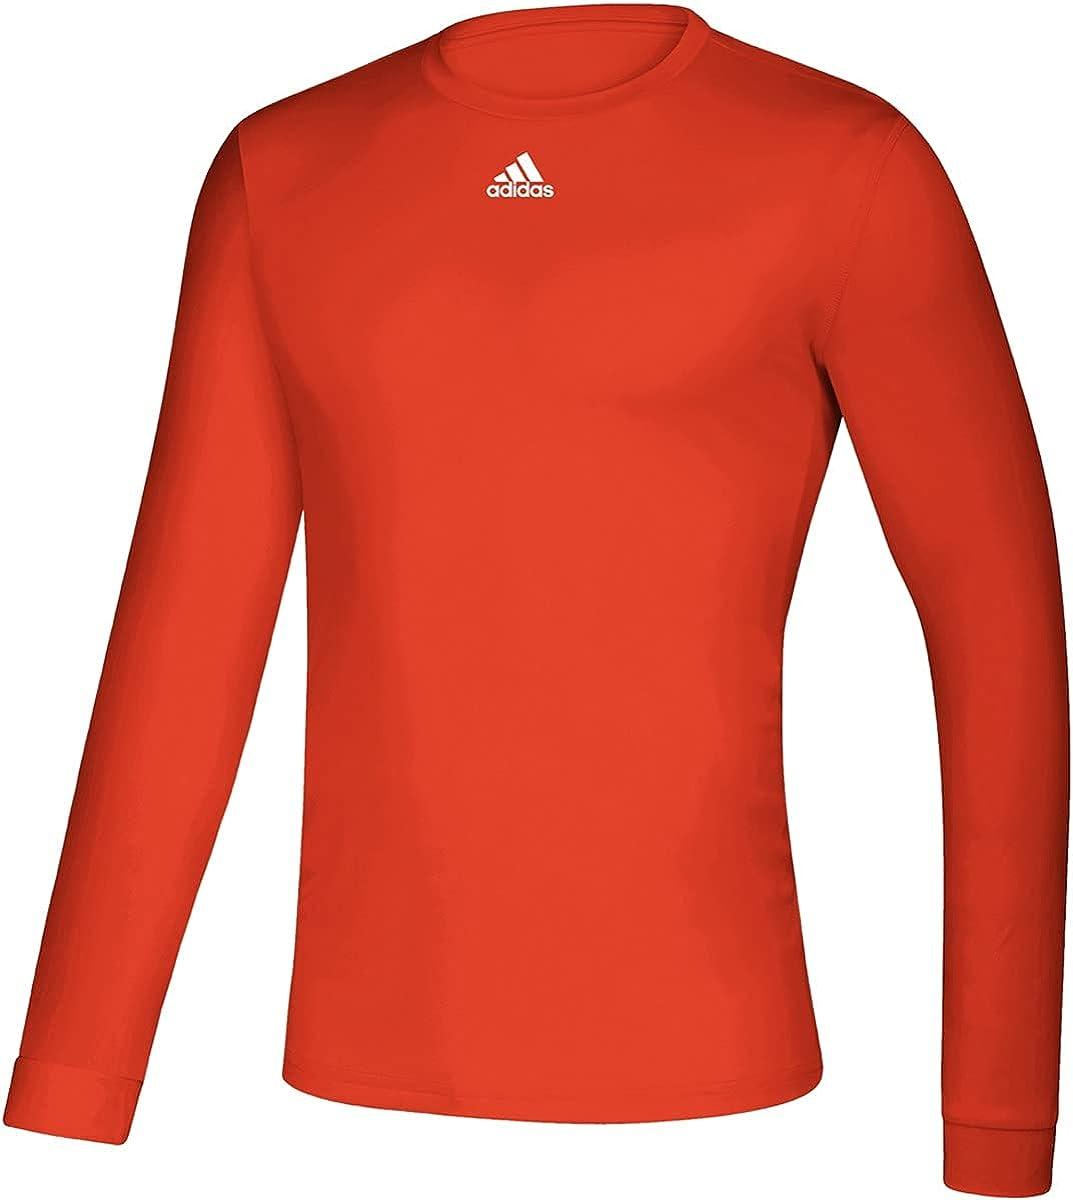 adidas Climalite Creator Long Sleeve T-Shirt (EK012)